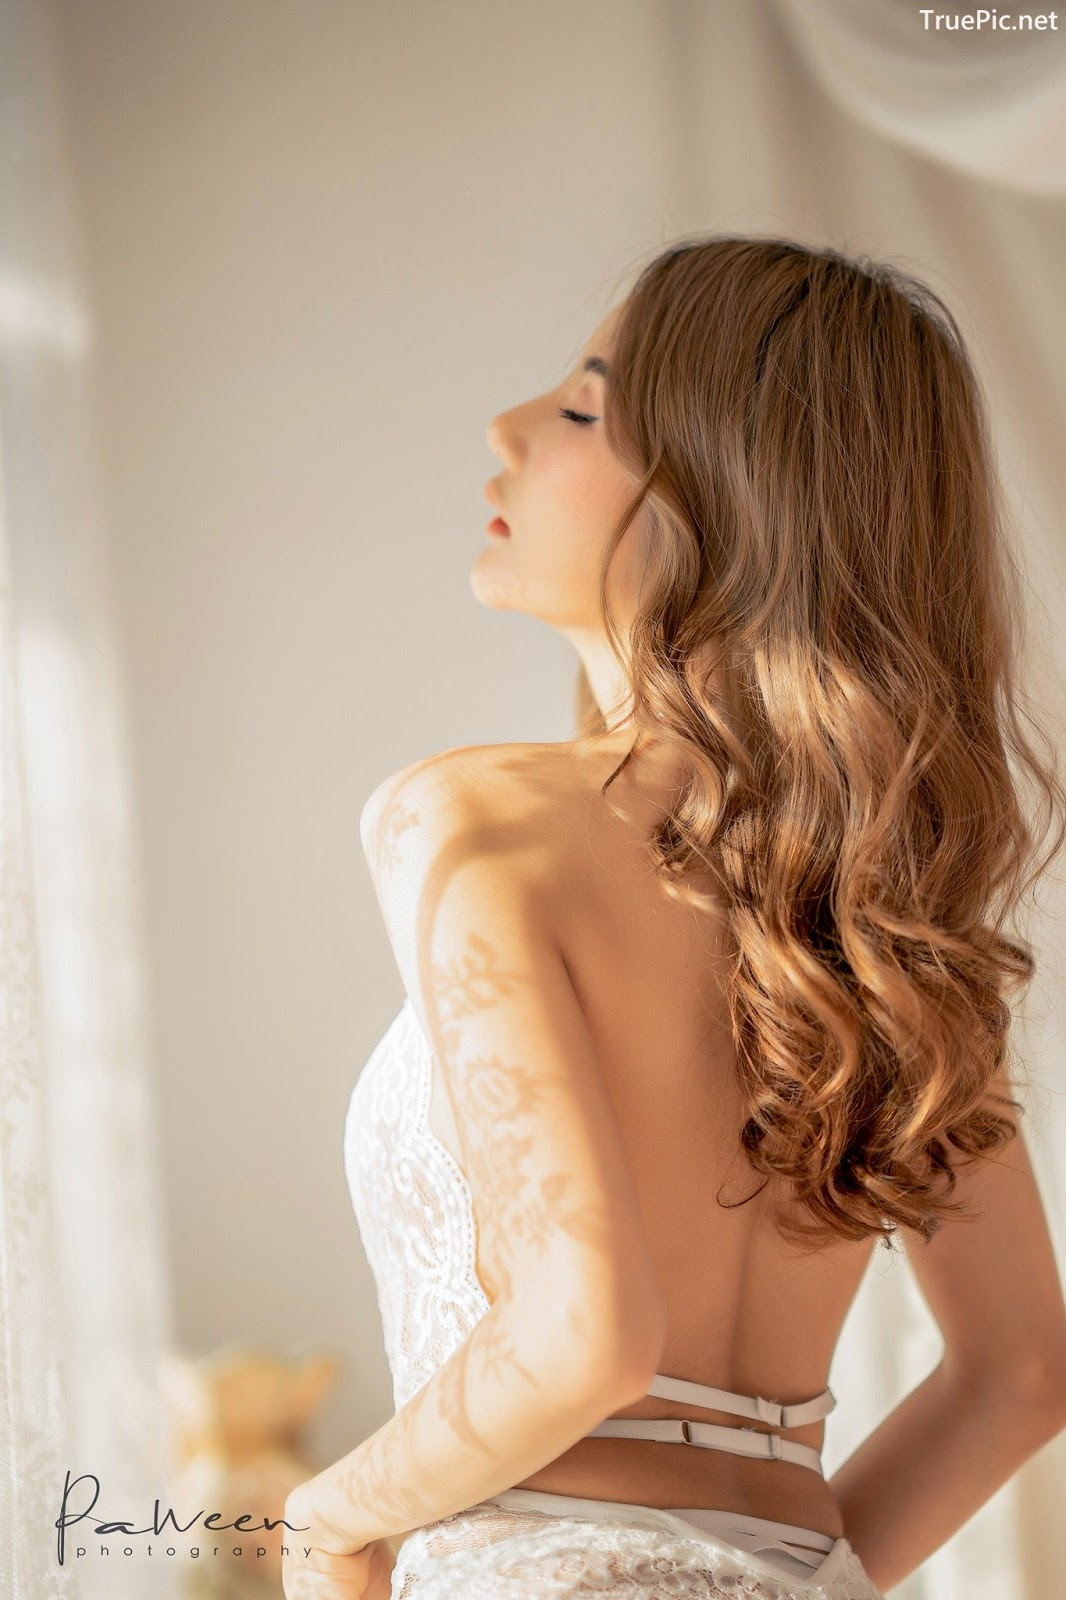 Image Thailand Model - Atittaya Chaiyasing - White Lace Lingerie - TruePic.net - Picture-5